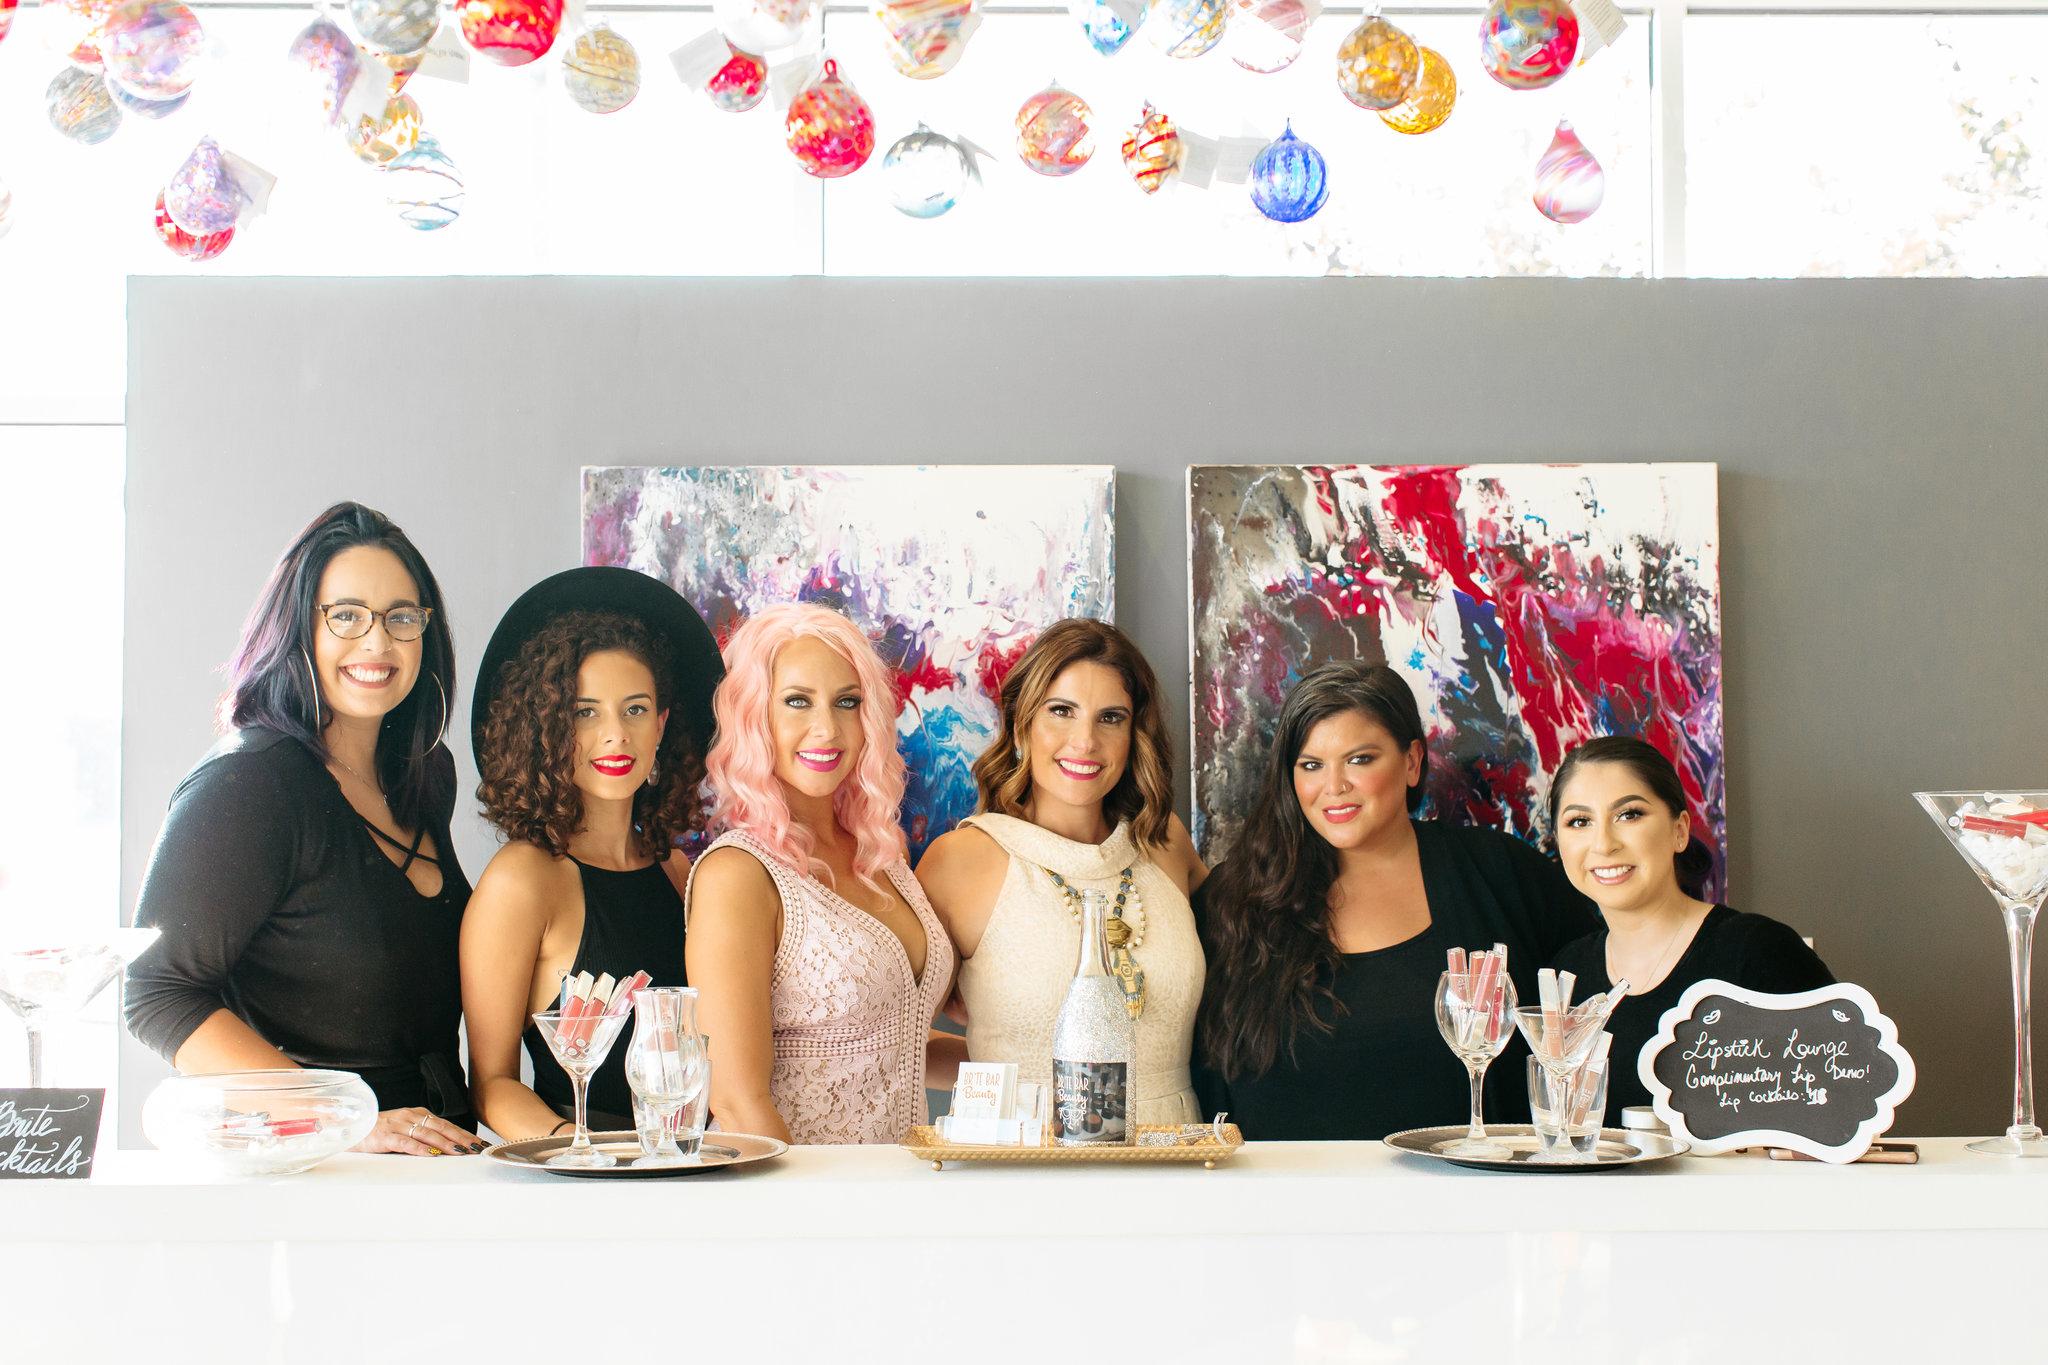 Alexa-Vossler-Photo_Dallas-Event-Photographer_Brite-Bar-Beauty-2018-Lipstick-Launch-Party-125.jpg